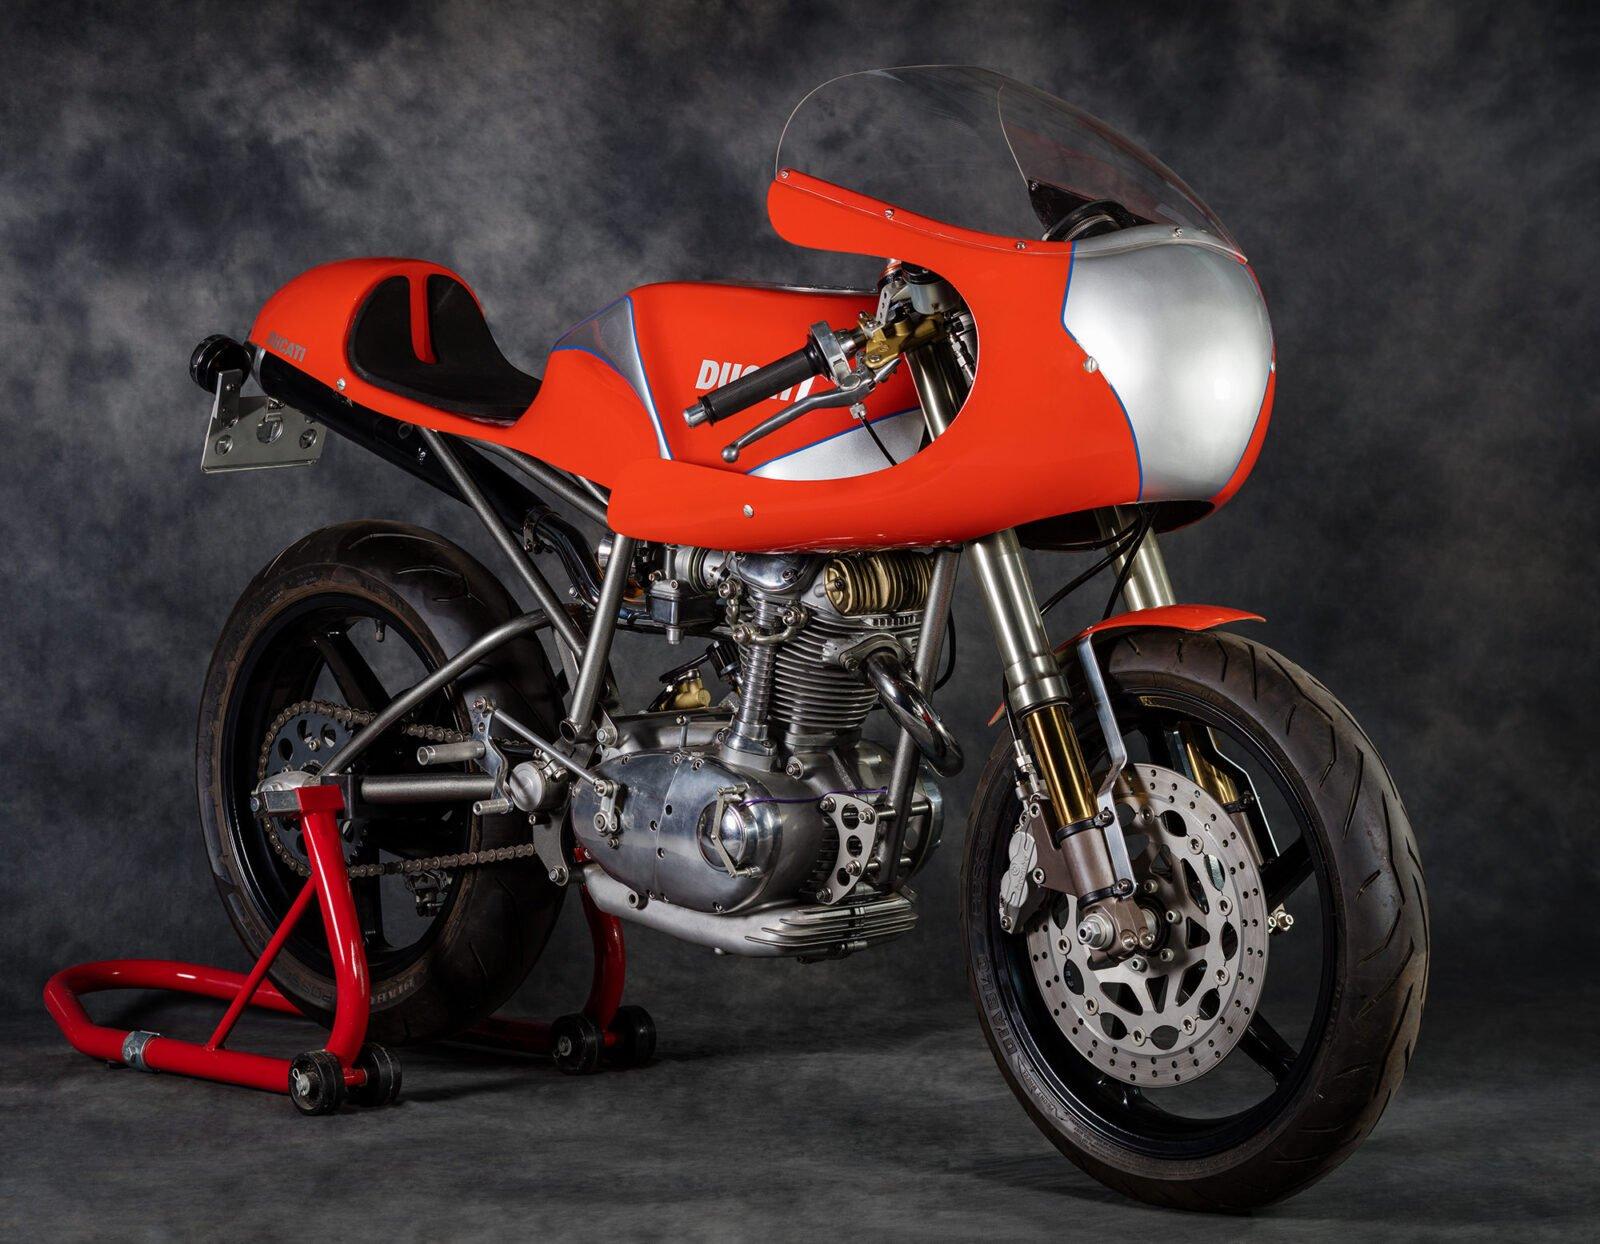 Ducati Condor 1 1600x1244 - Ducati Condor Racer by BevelTech